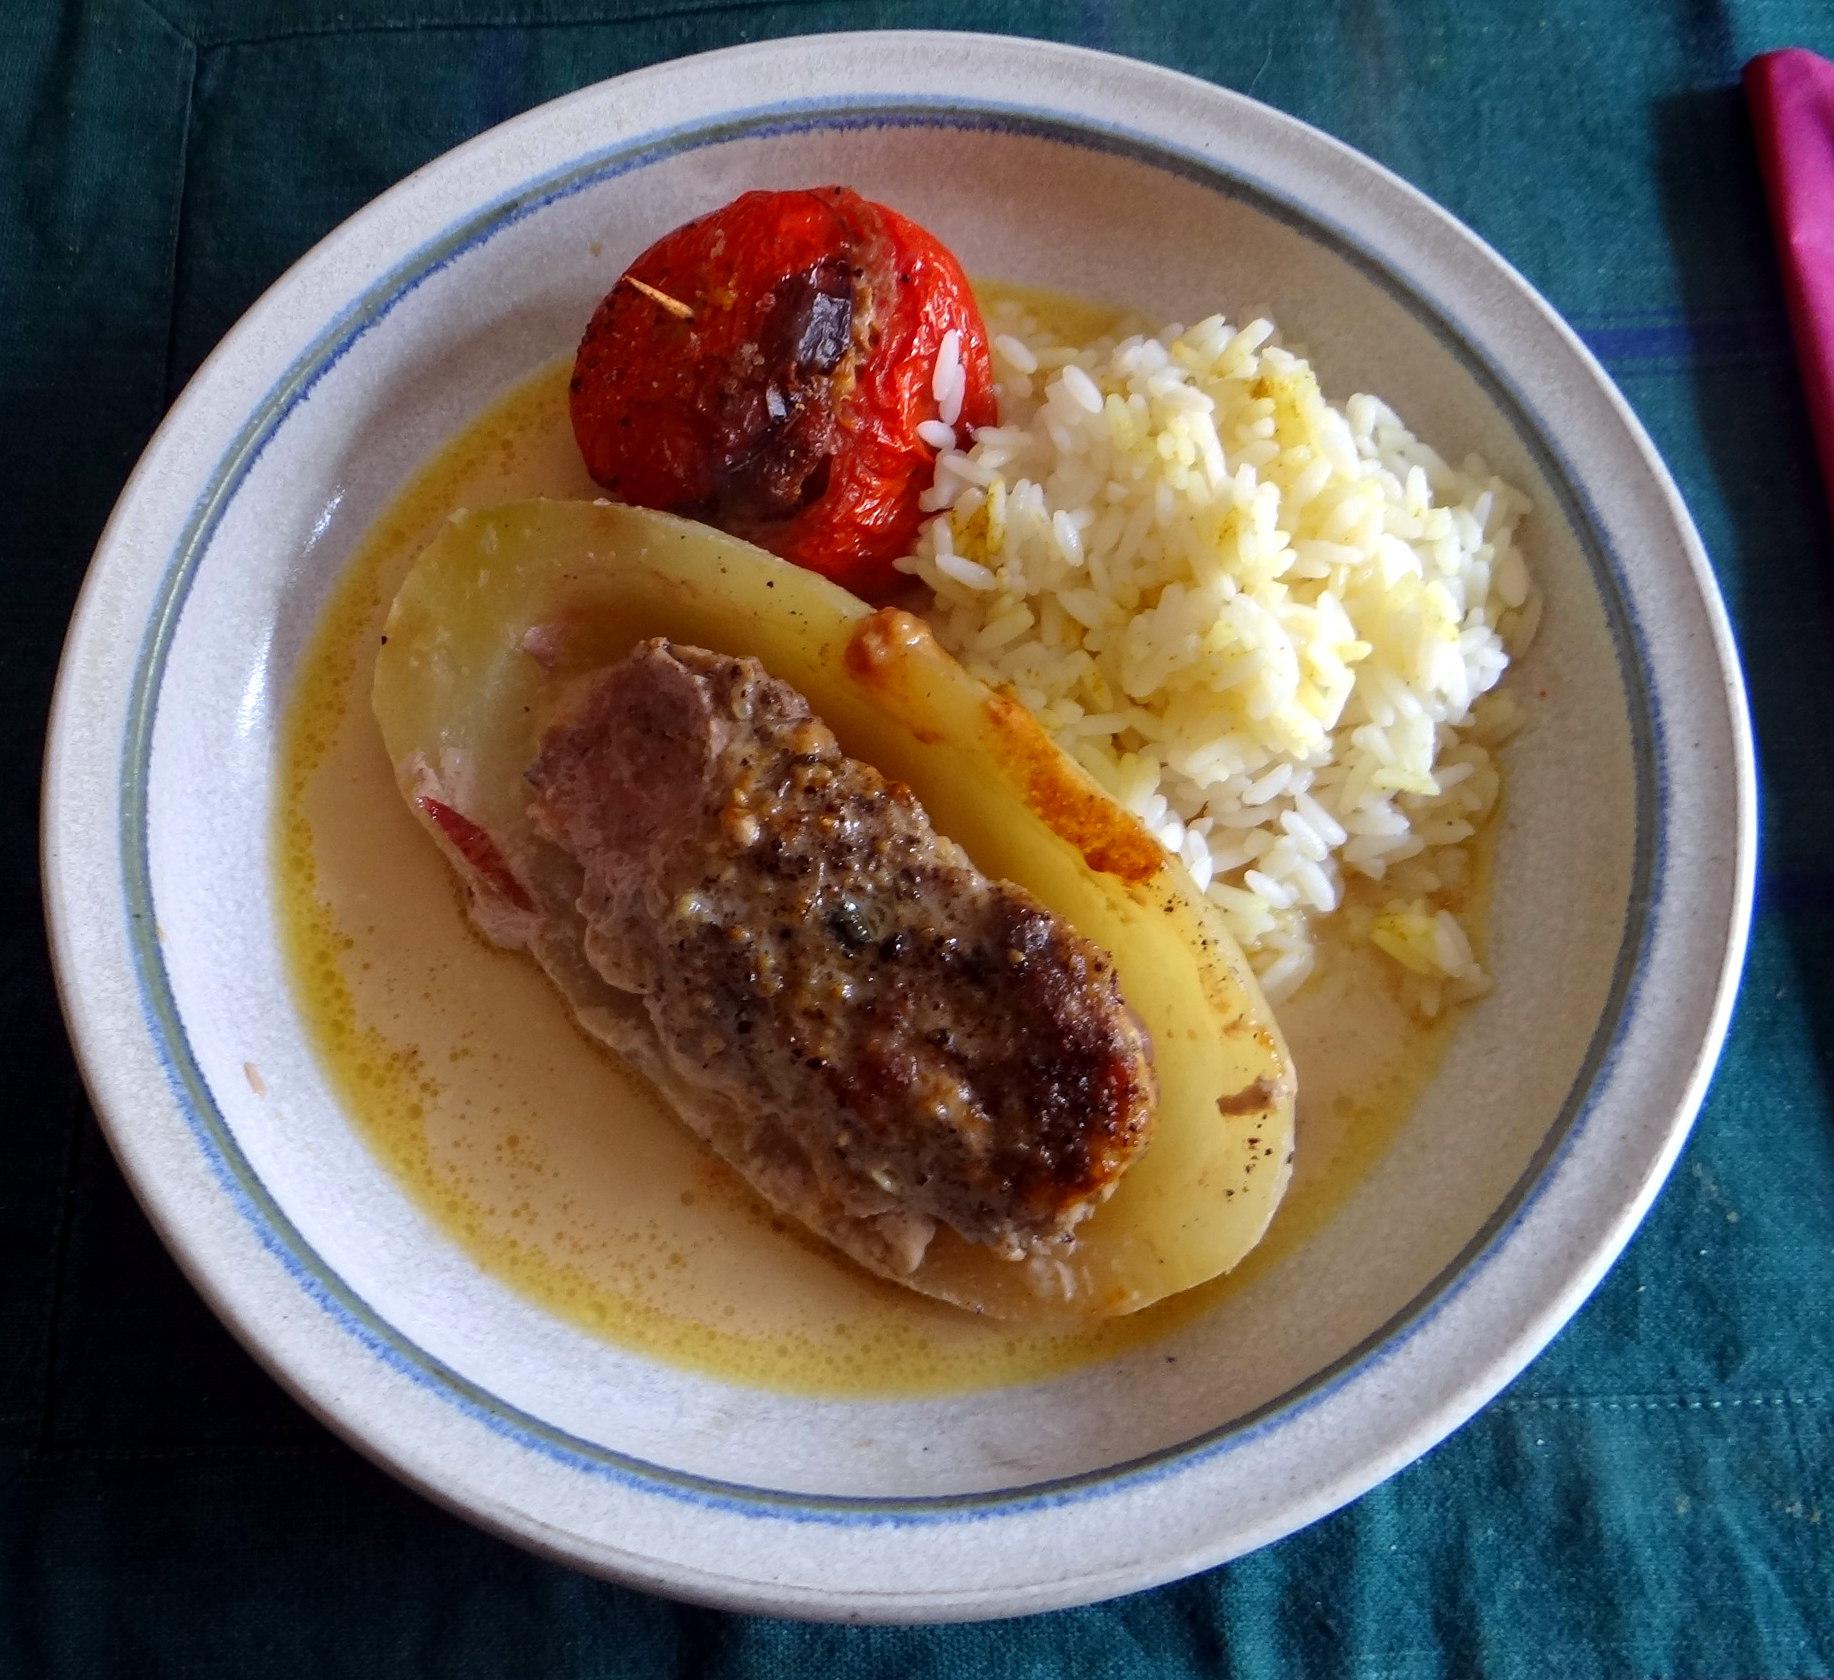 Gefüllte Paprika,Schmorgurke,Tomate,Zucchini,Reis,Bananeneis (1)